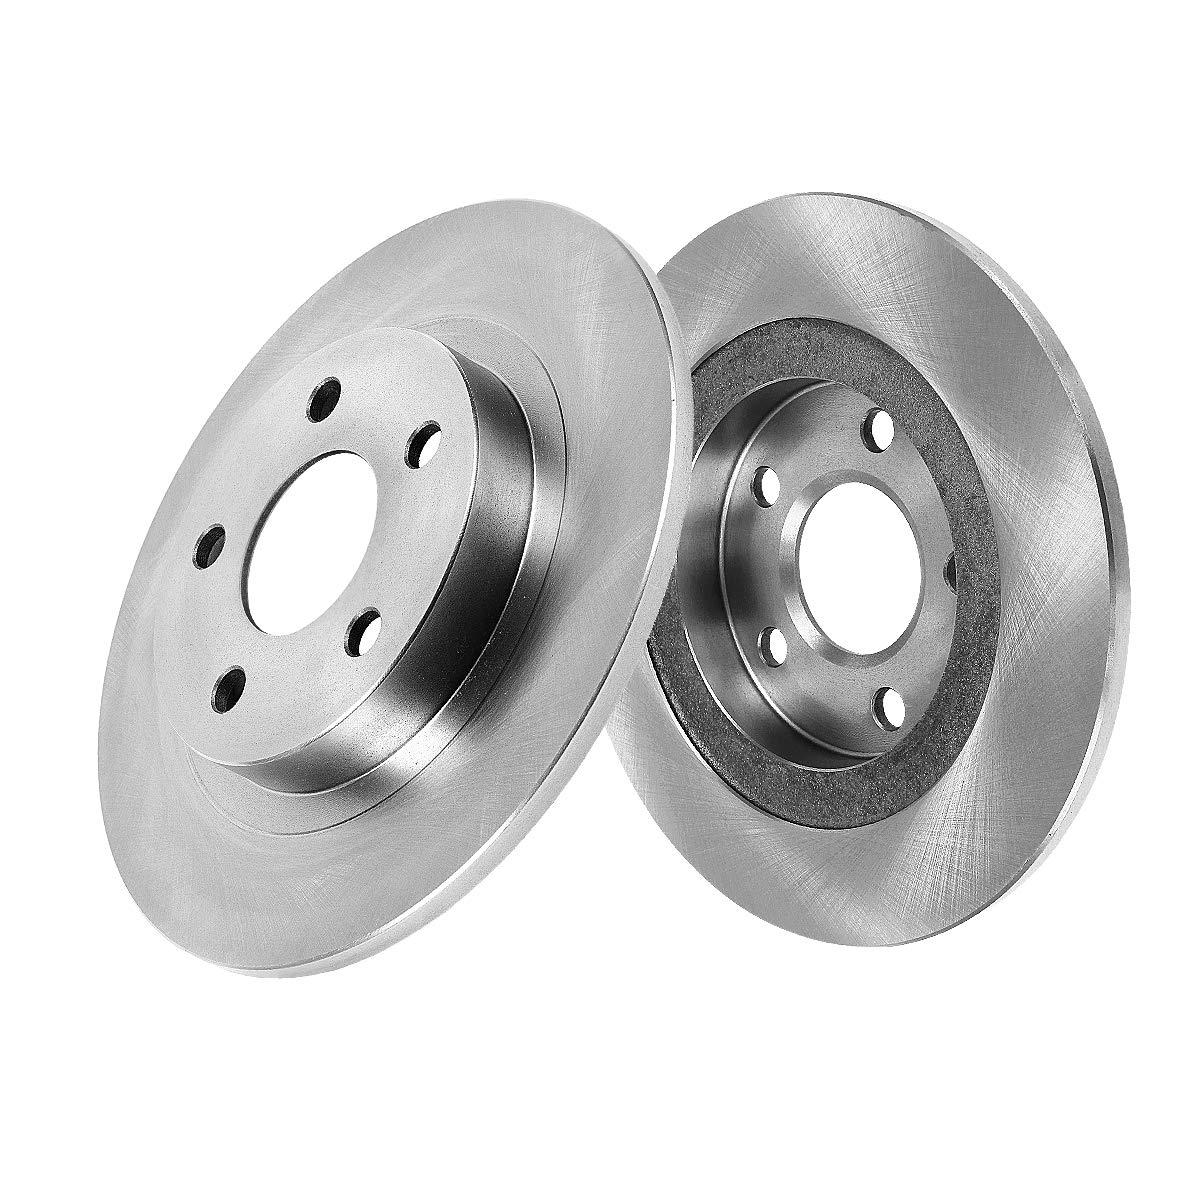 REAR Premium Grade OE 269 mm [2] Rotors Set CBO200418 [ Lexus ES300 Toyota Camry Solara ] Callahan Brake Parts